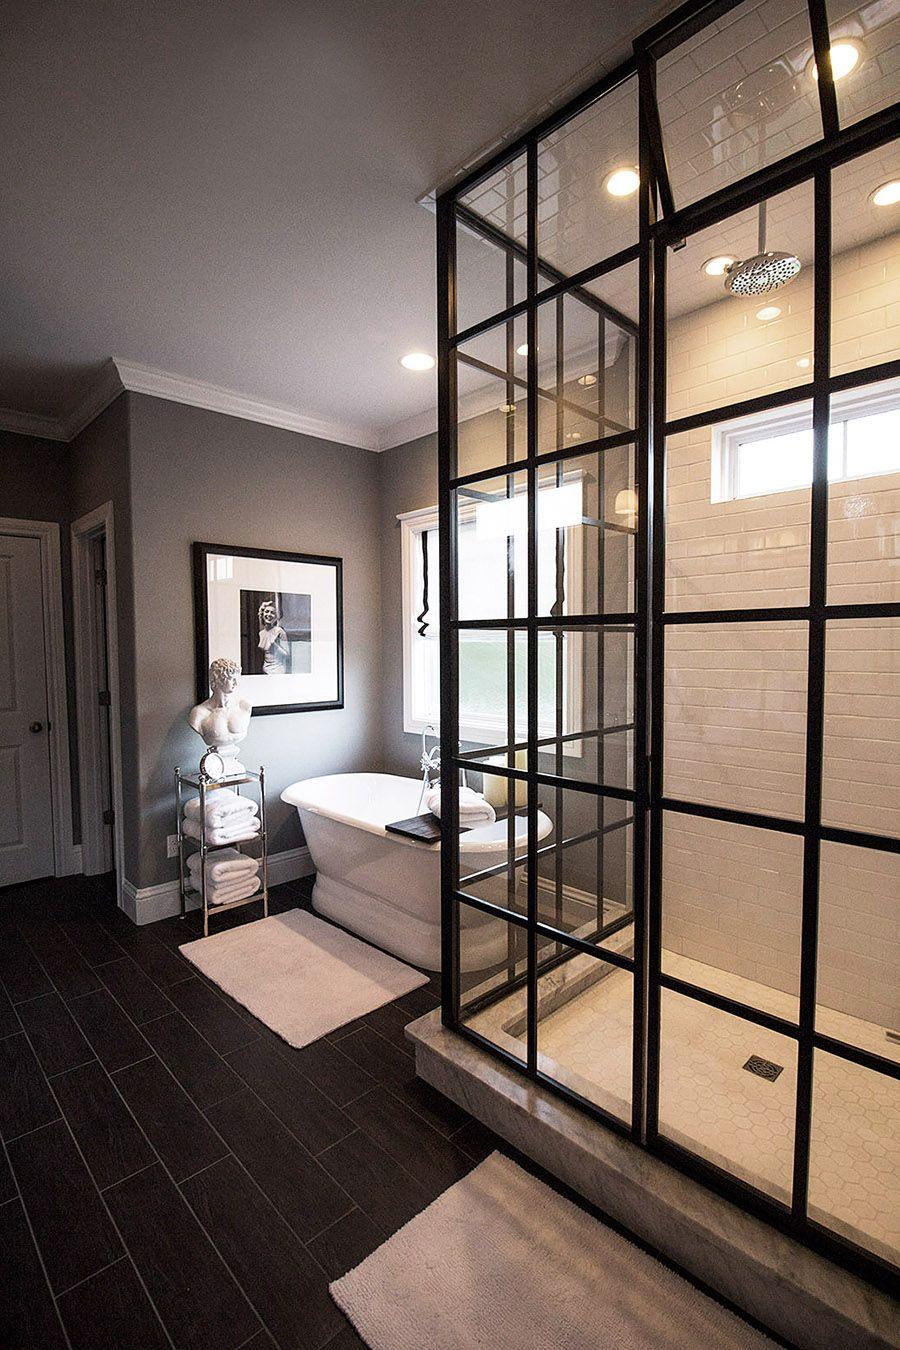 Bath under window ideas  dramatic master bathroom ideas with freestanding tub and pane glass